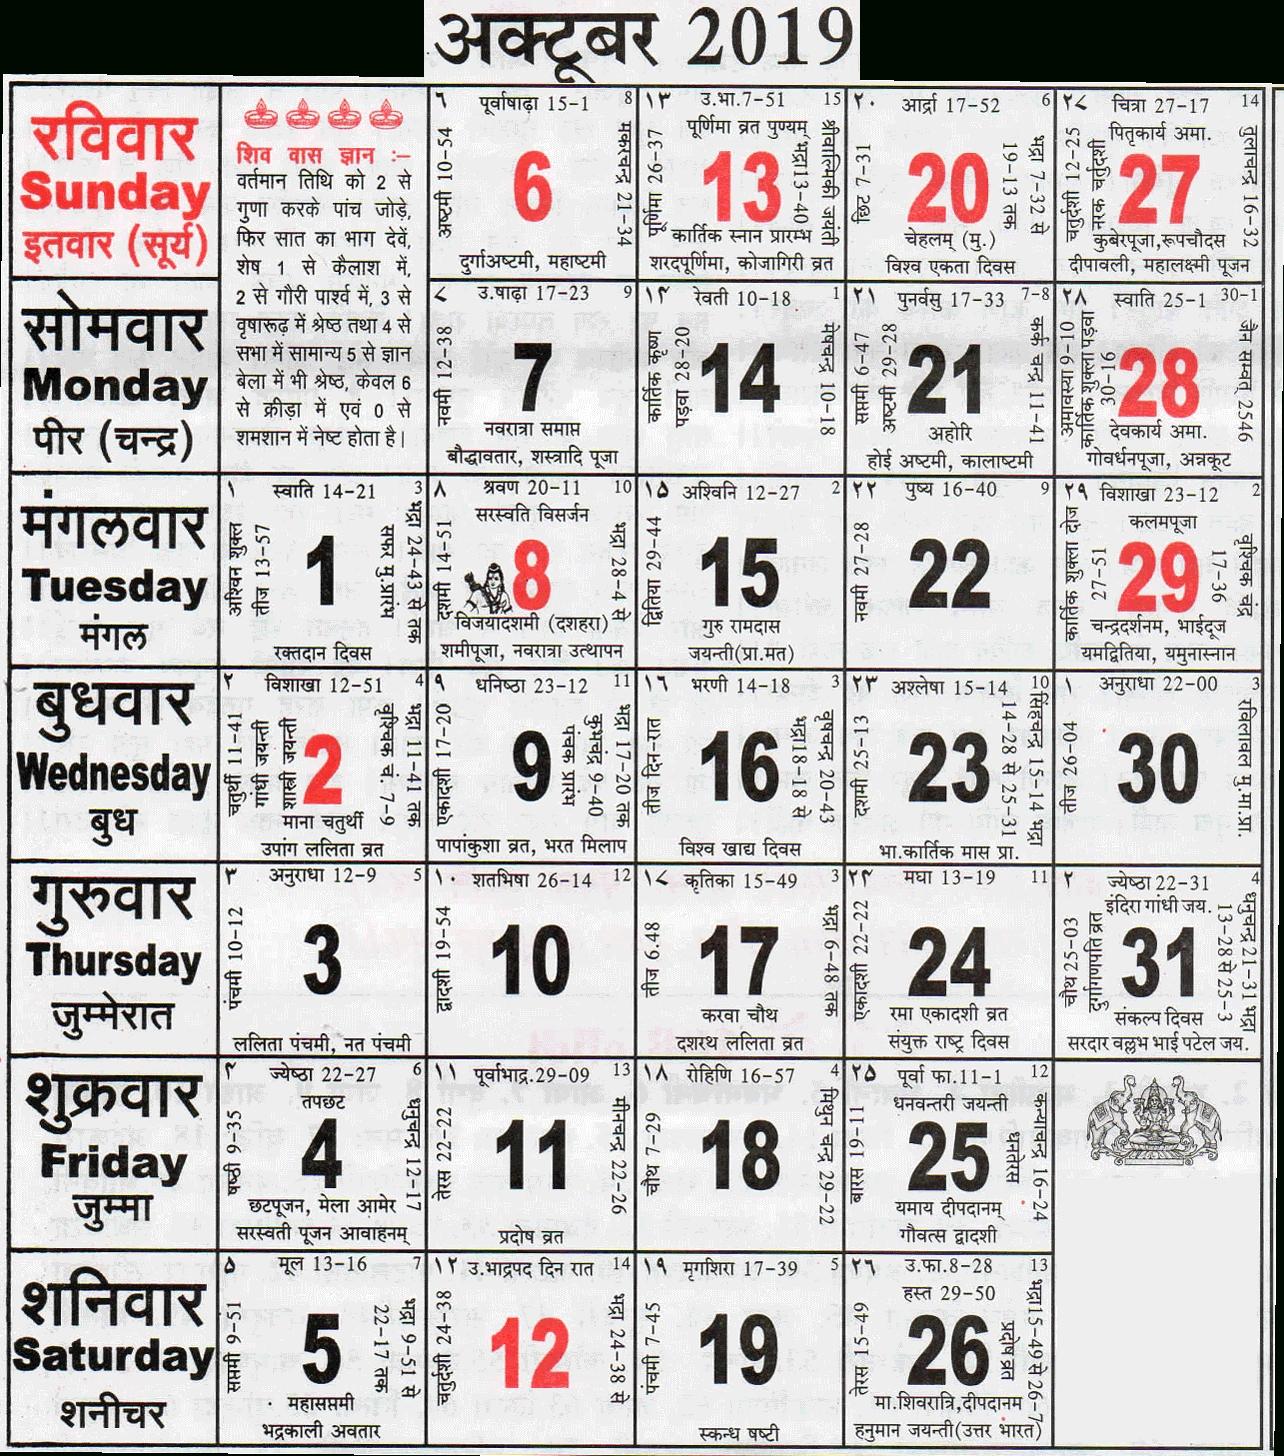 Hindi Monthly Calendar 2019 October | Year